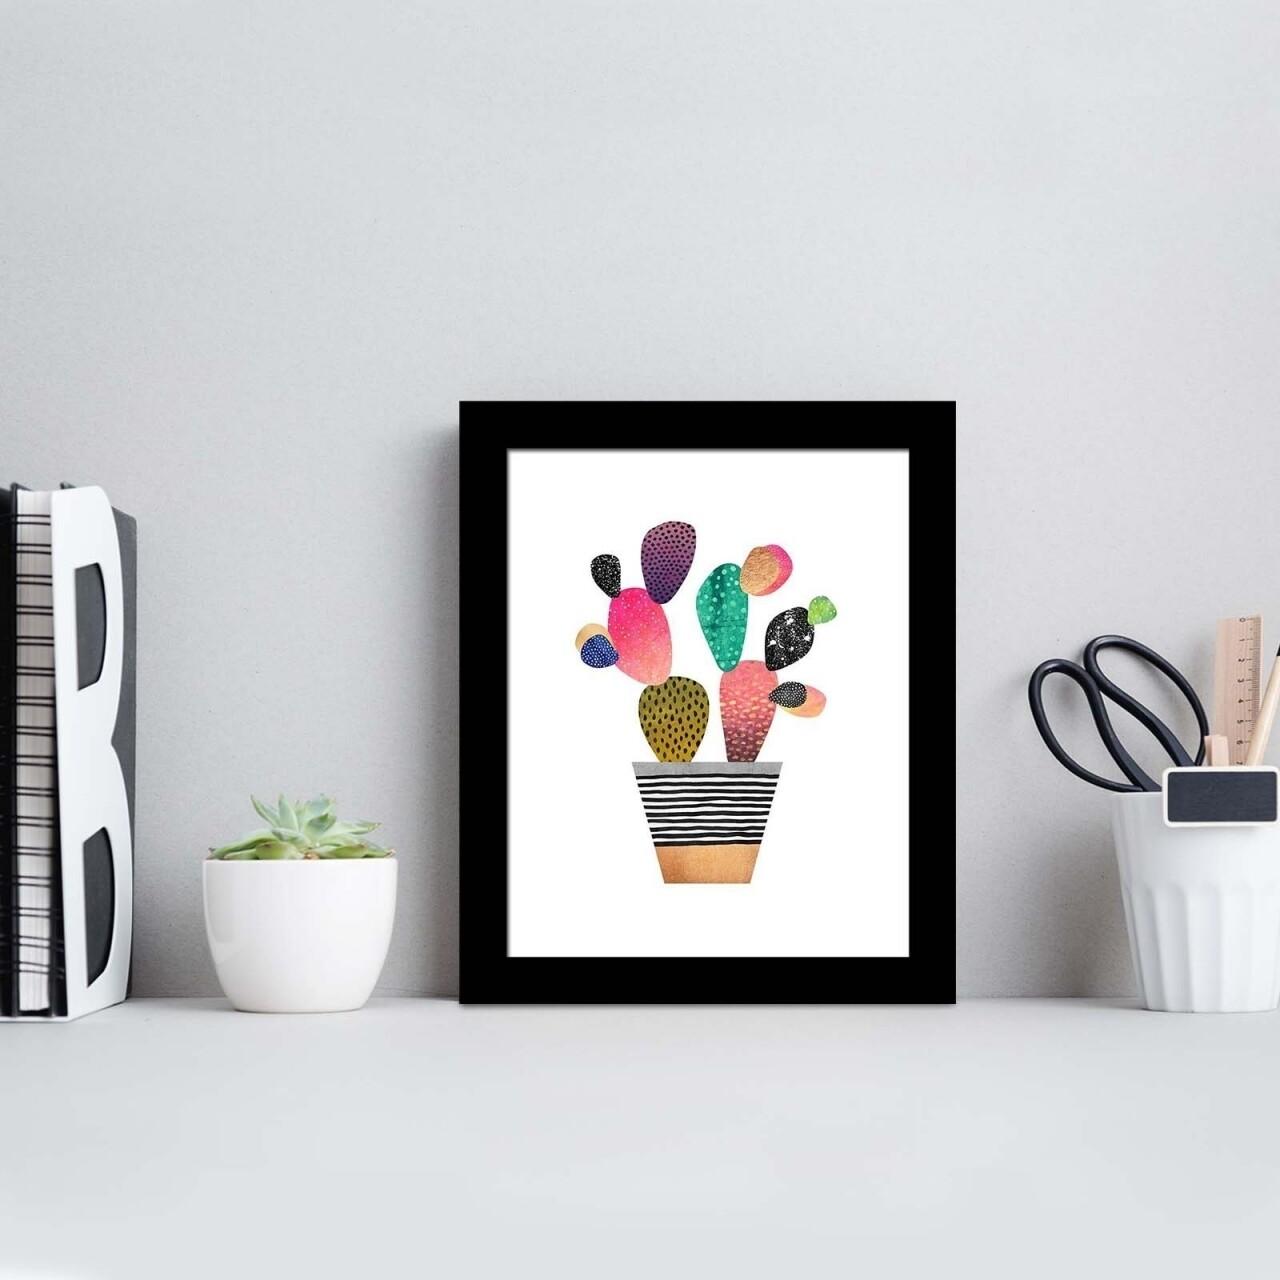 Tablou decorativ, Alpha Wall, Cactus, 23x28 cm